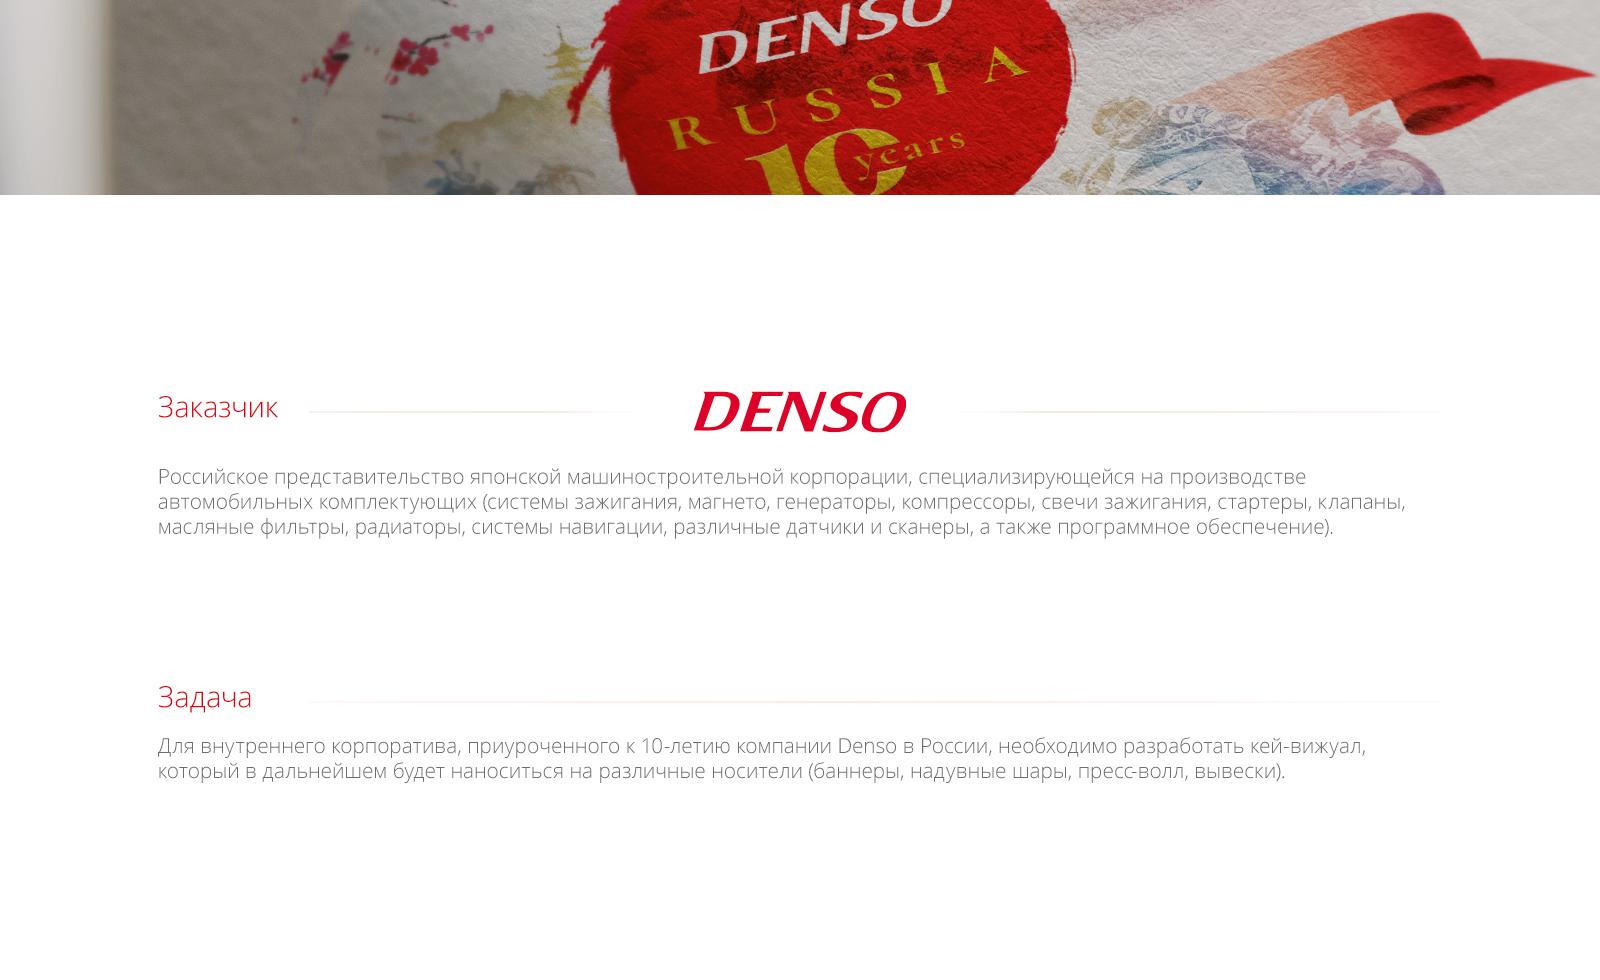 DENSO_key-visual__Мастерская_01.jpg